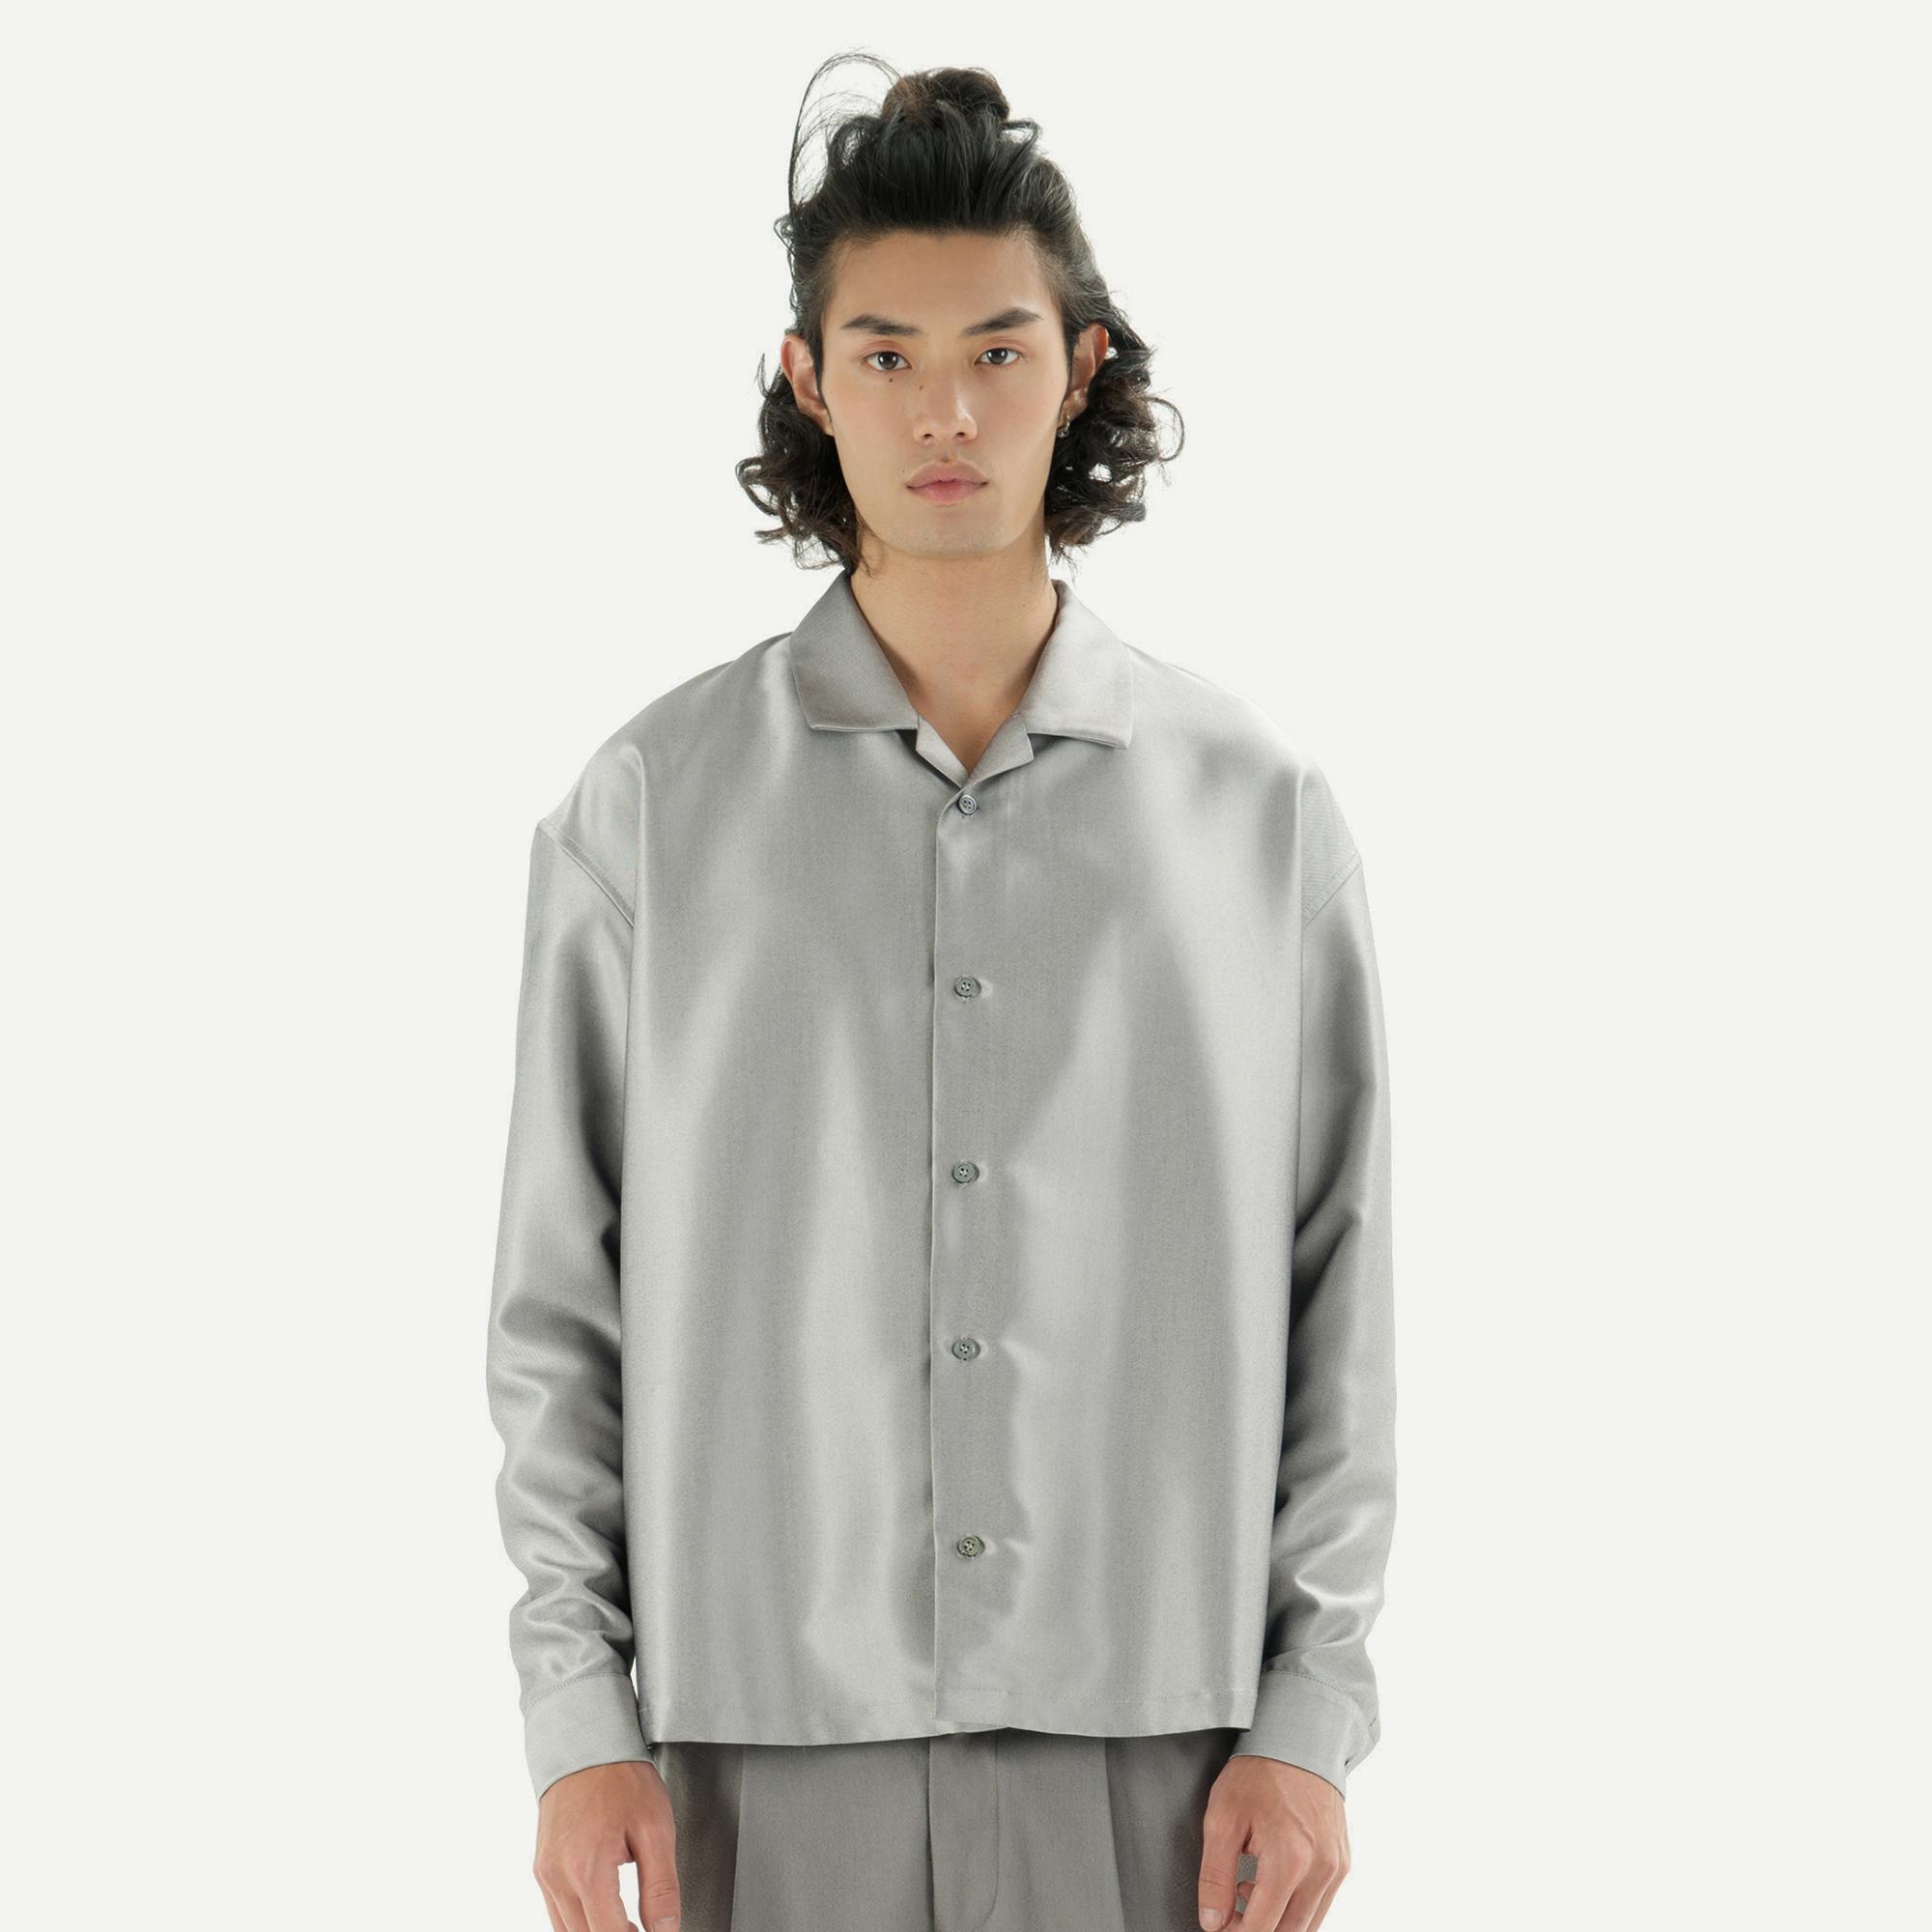 TENT STUDIO 18AW-M149 SHORT SHIRT 酒红/银色 高光感短款衬衫